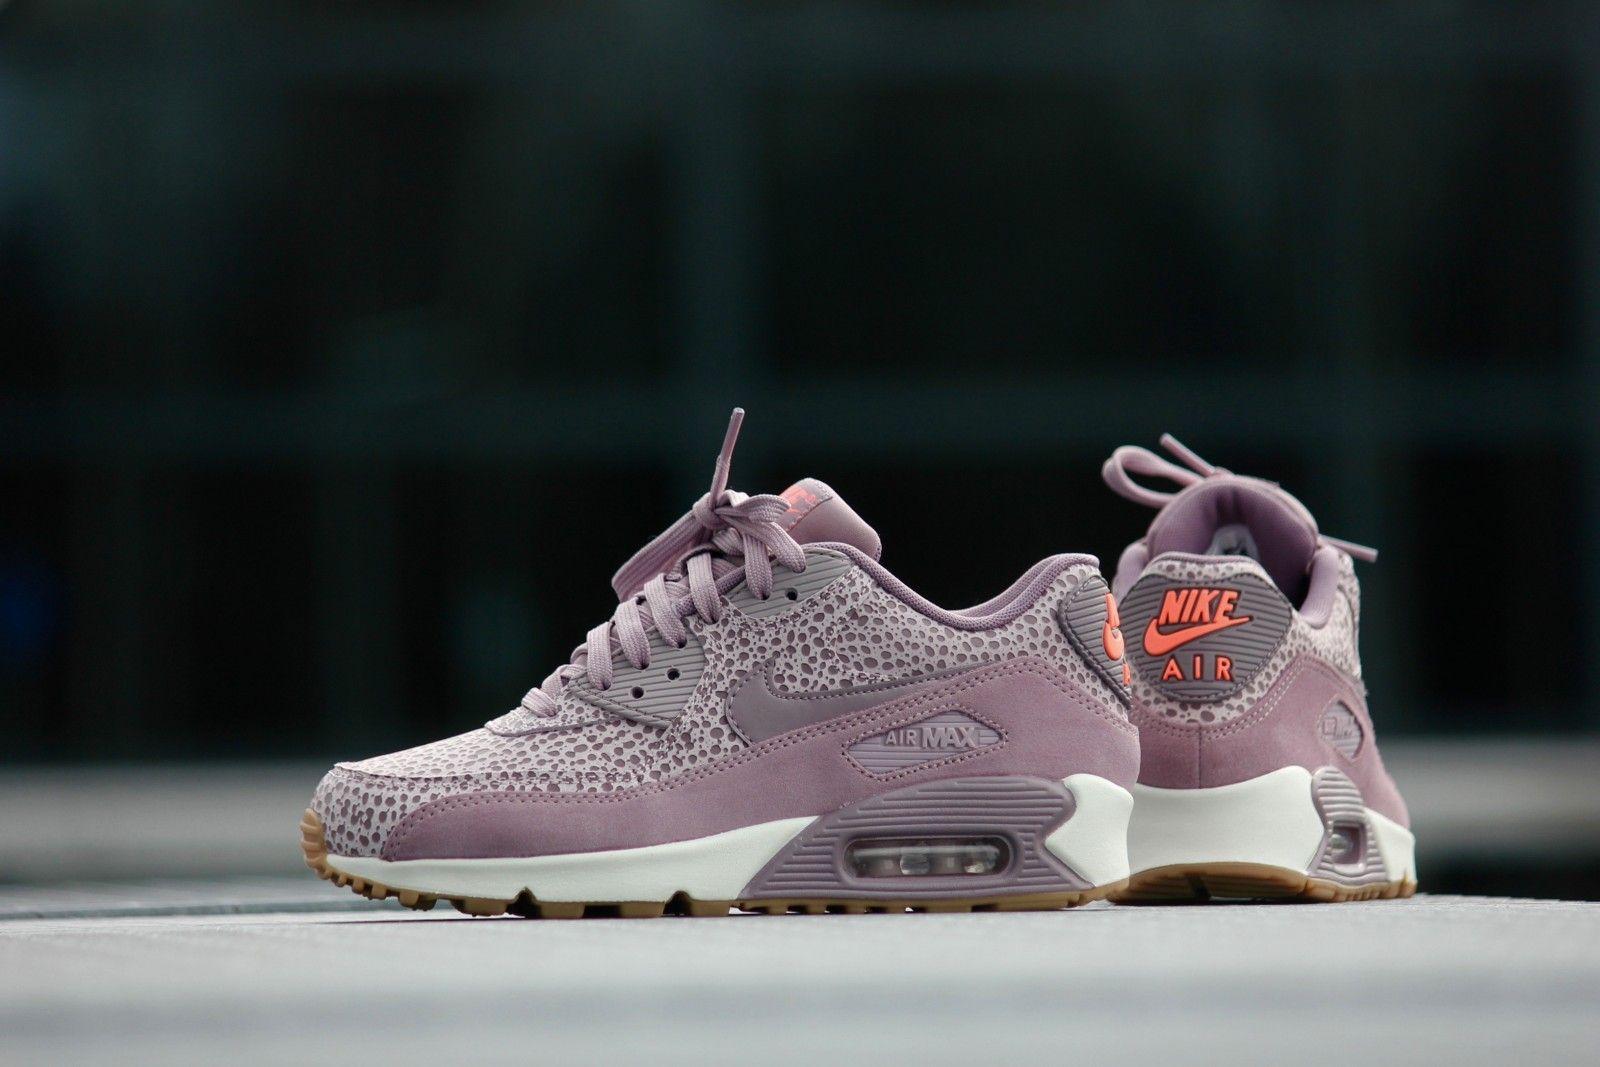 online store e6ed2 5a418 Nike WMNS Air Max 90 PRM Plum Fog  Purple Smoke - 443817-500